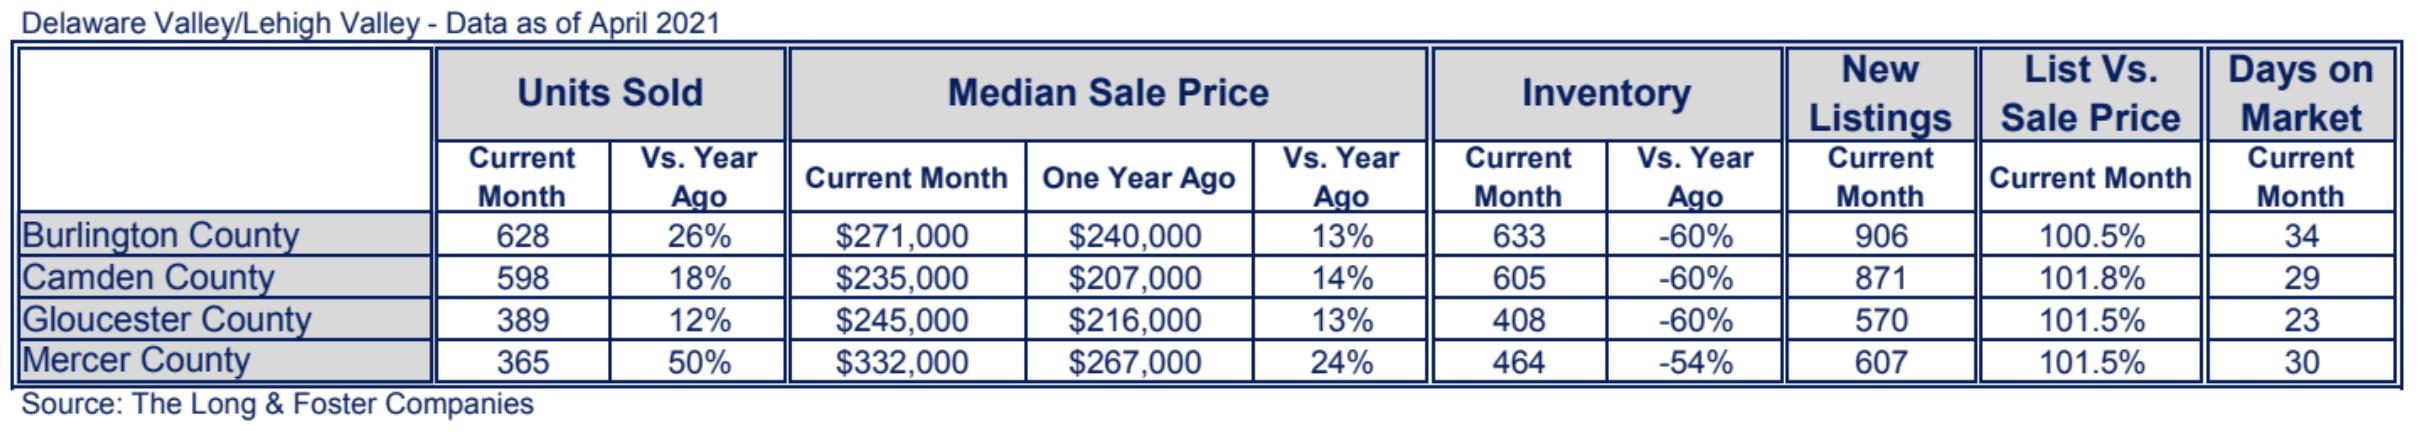 New Jersey Suburbs Market Minute Chart April 2021